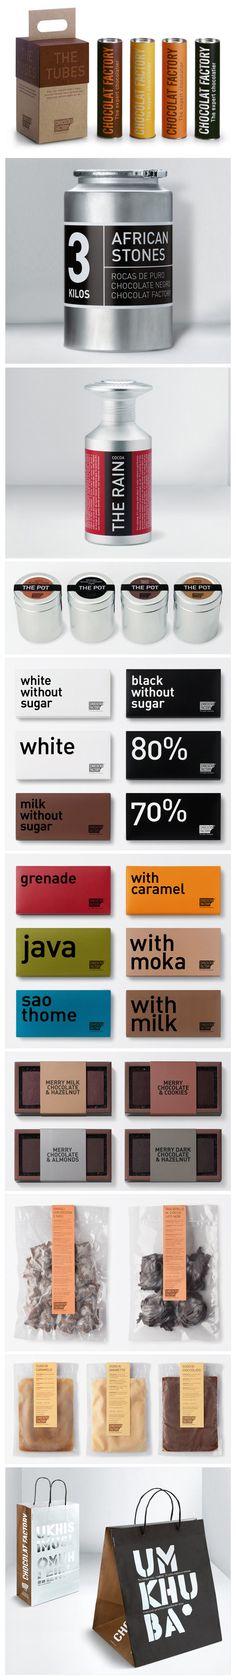 Chocolat Factory / Designed by Ruiz+Company